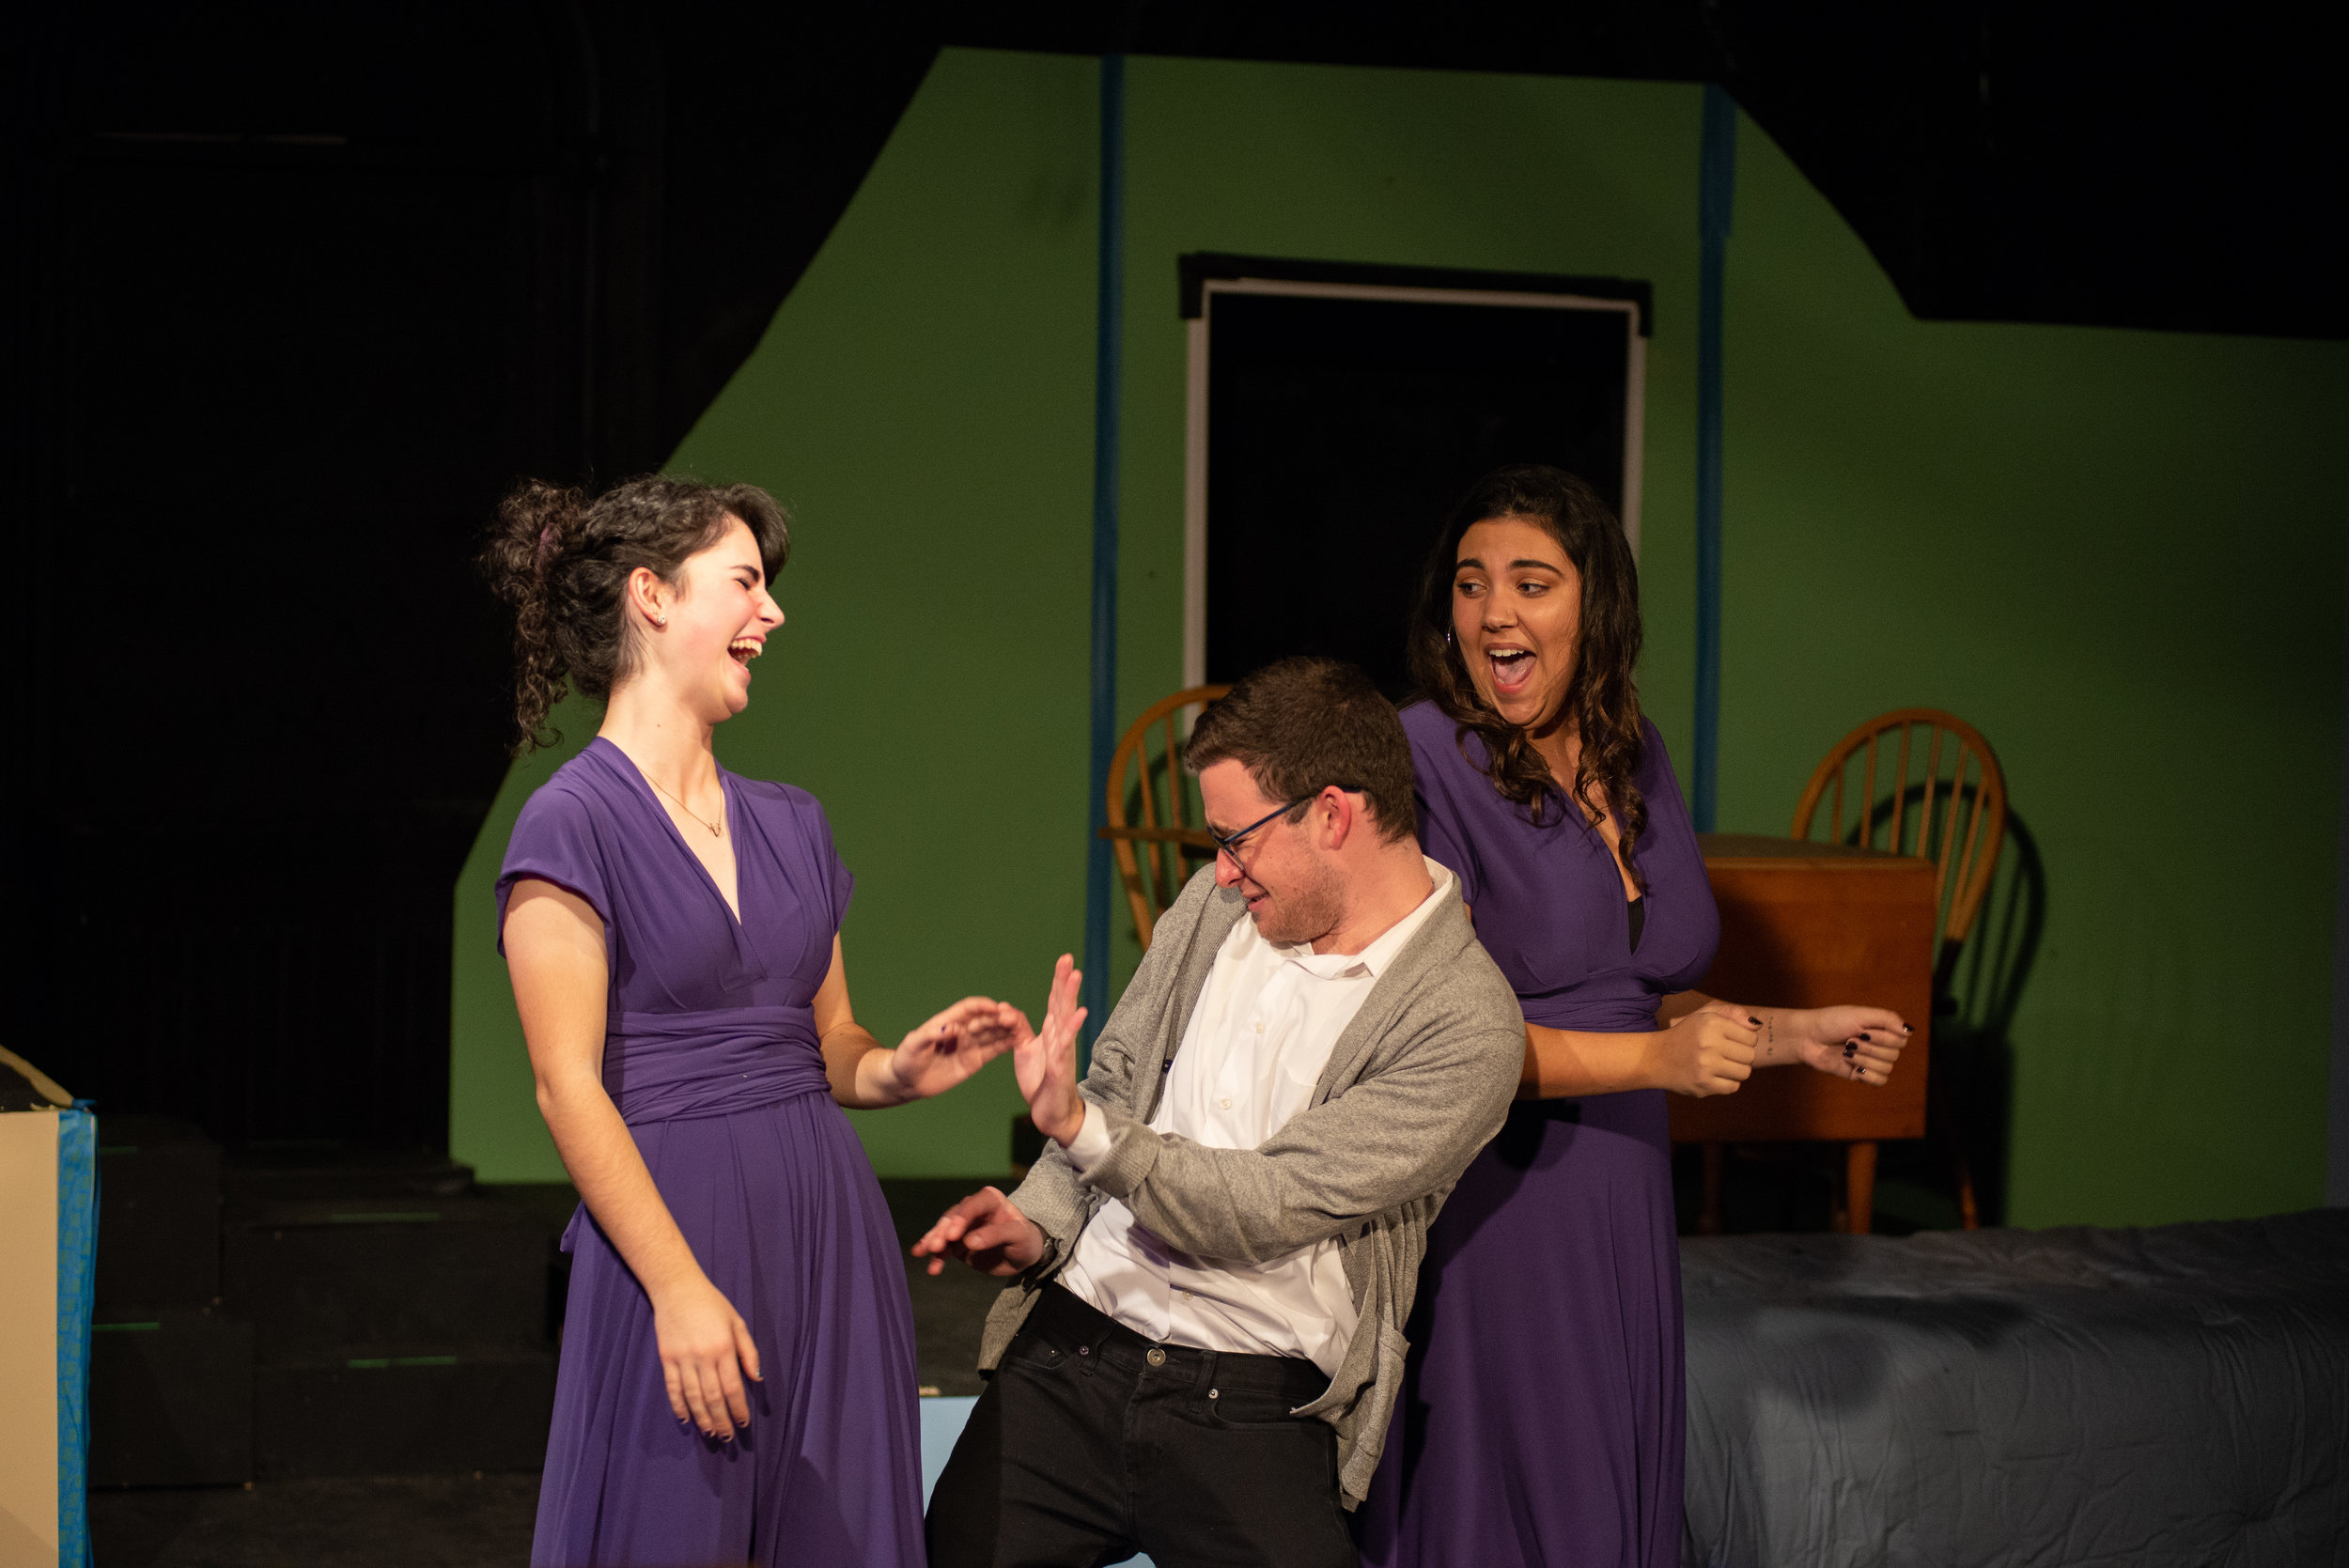 Steph Bradli (Laura), John Lerman (Jordan), Sabrina Dunn (Vanessa)